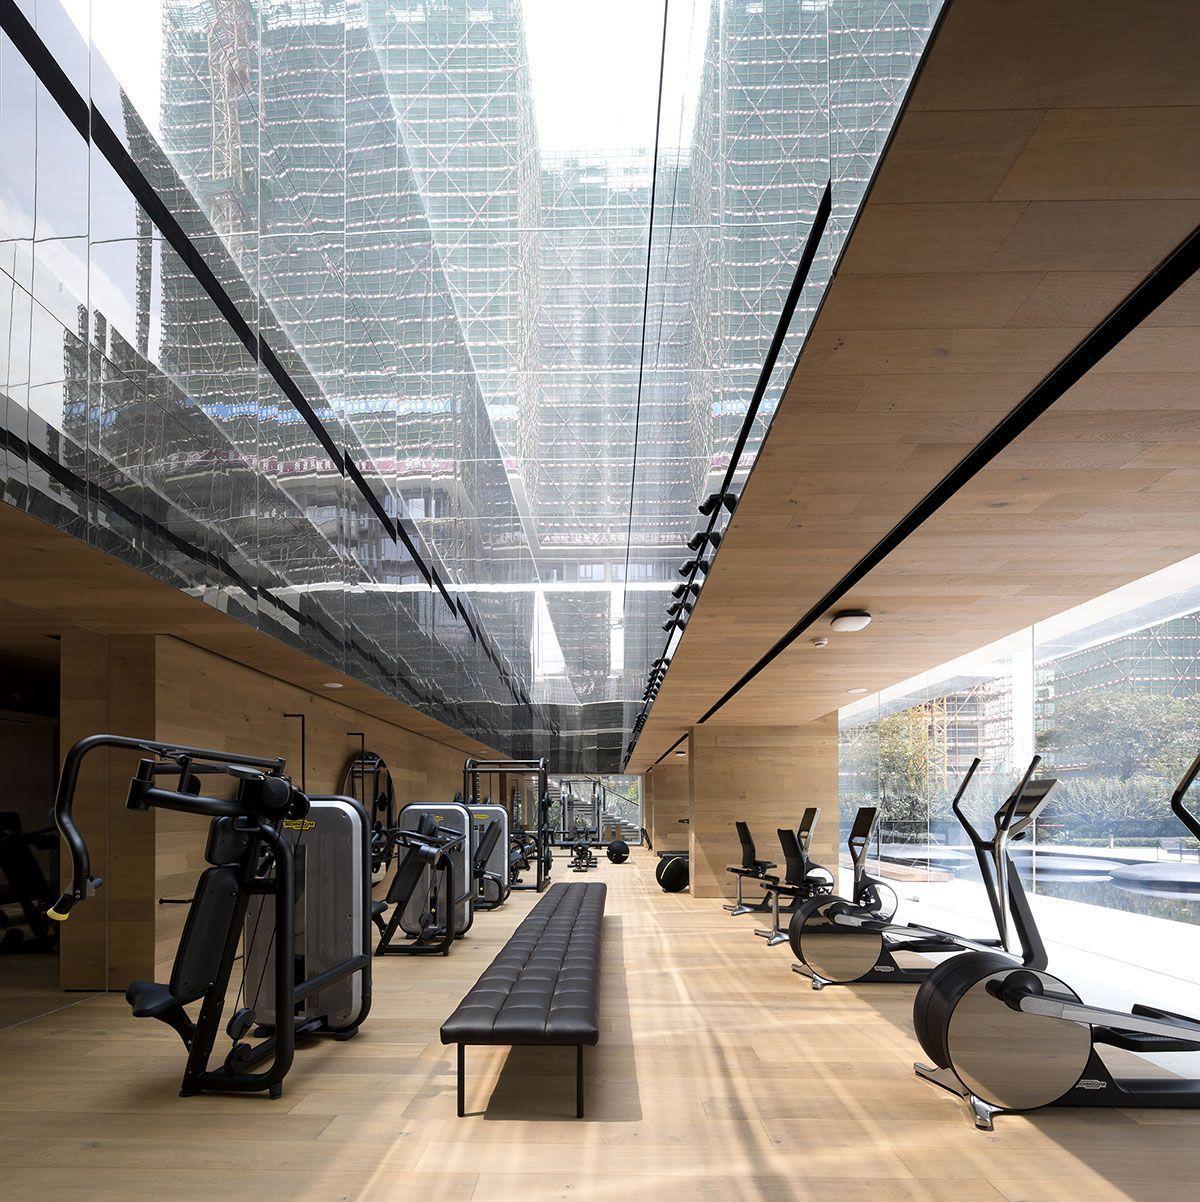 Luxury Gym In China Embraces Sleek And Minimal Design Curbed In 2020 Luxury Gym Minimal Design Design